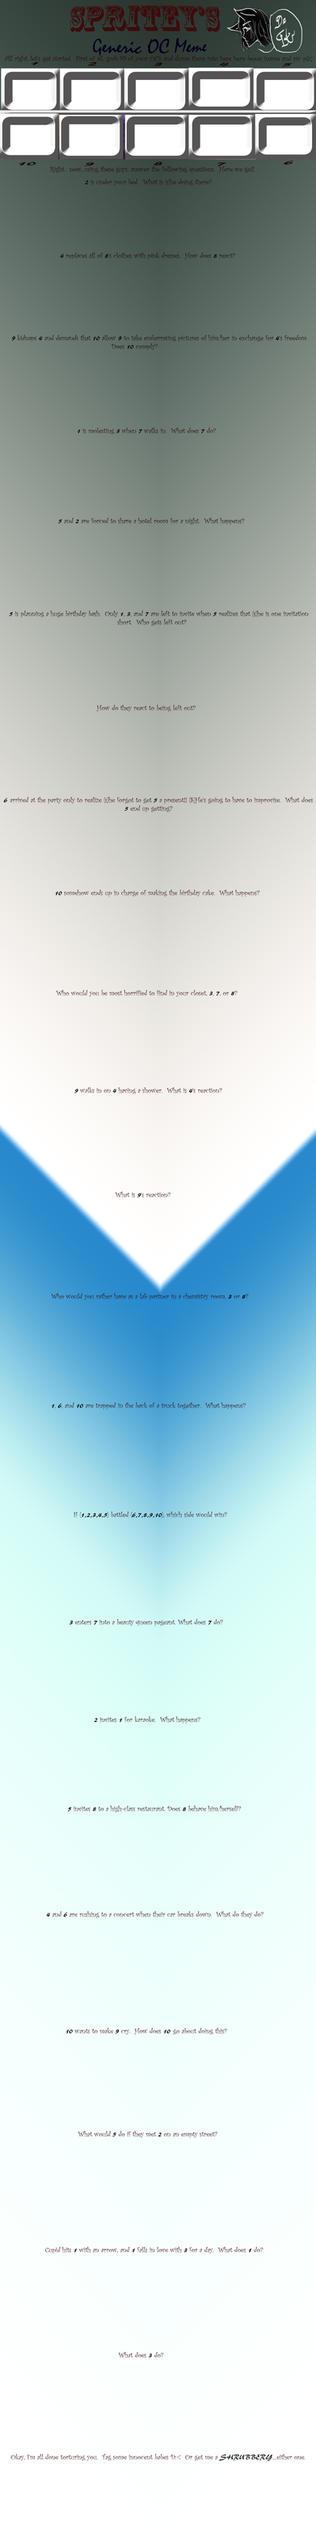 Blank Generic OC Meme by the-suns-moon